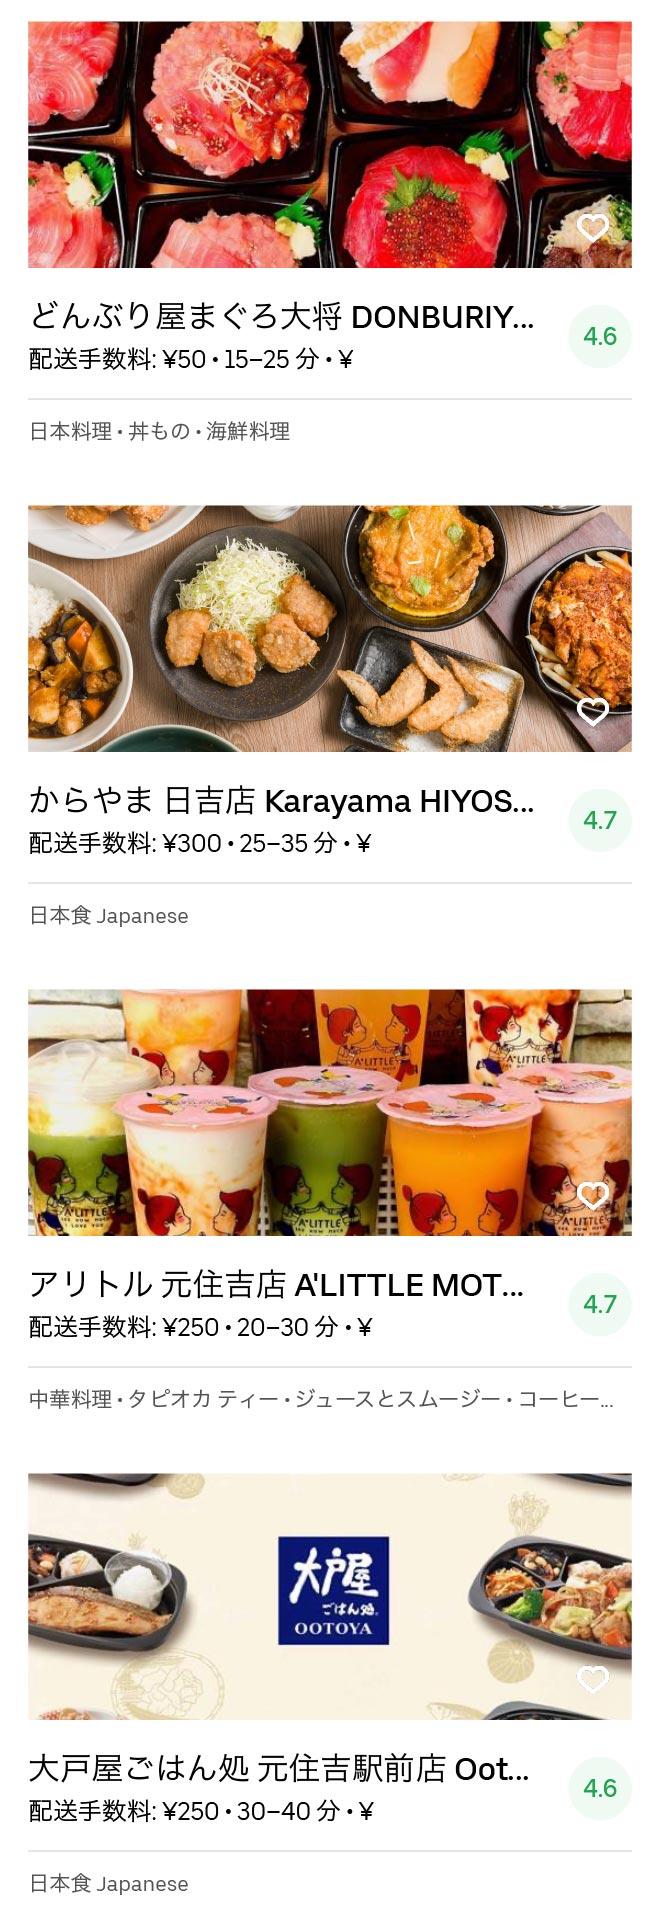 Shin kawasaki menu 2004 05